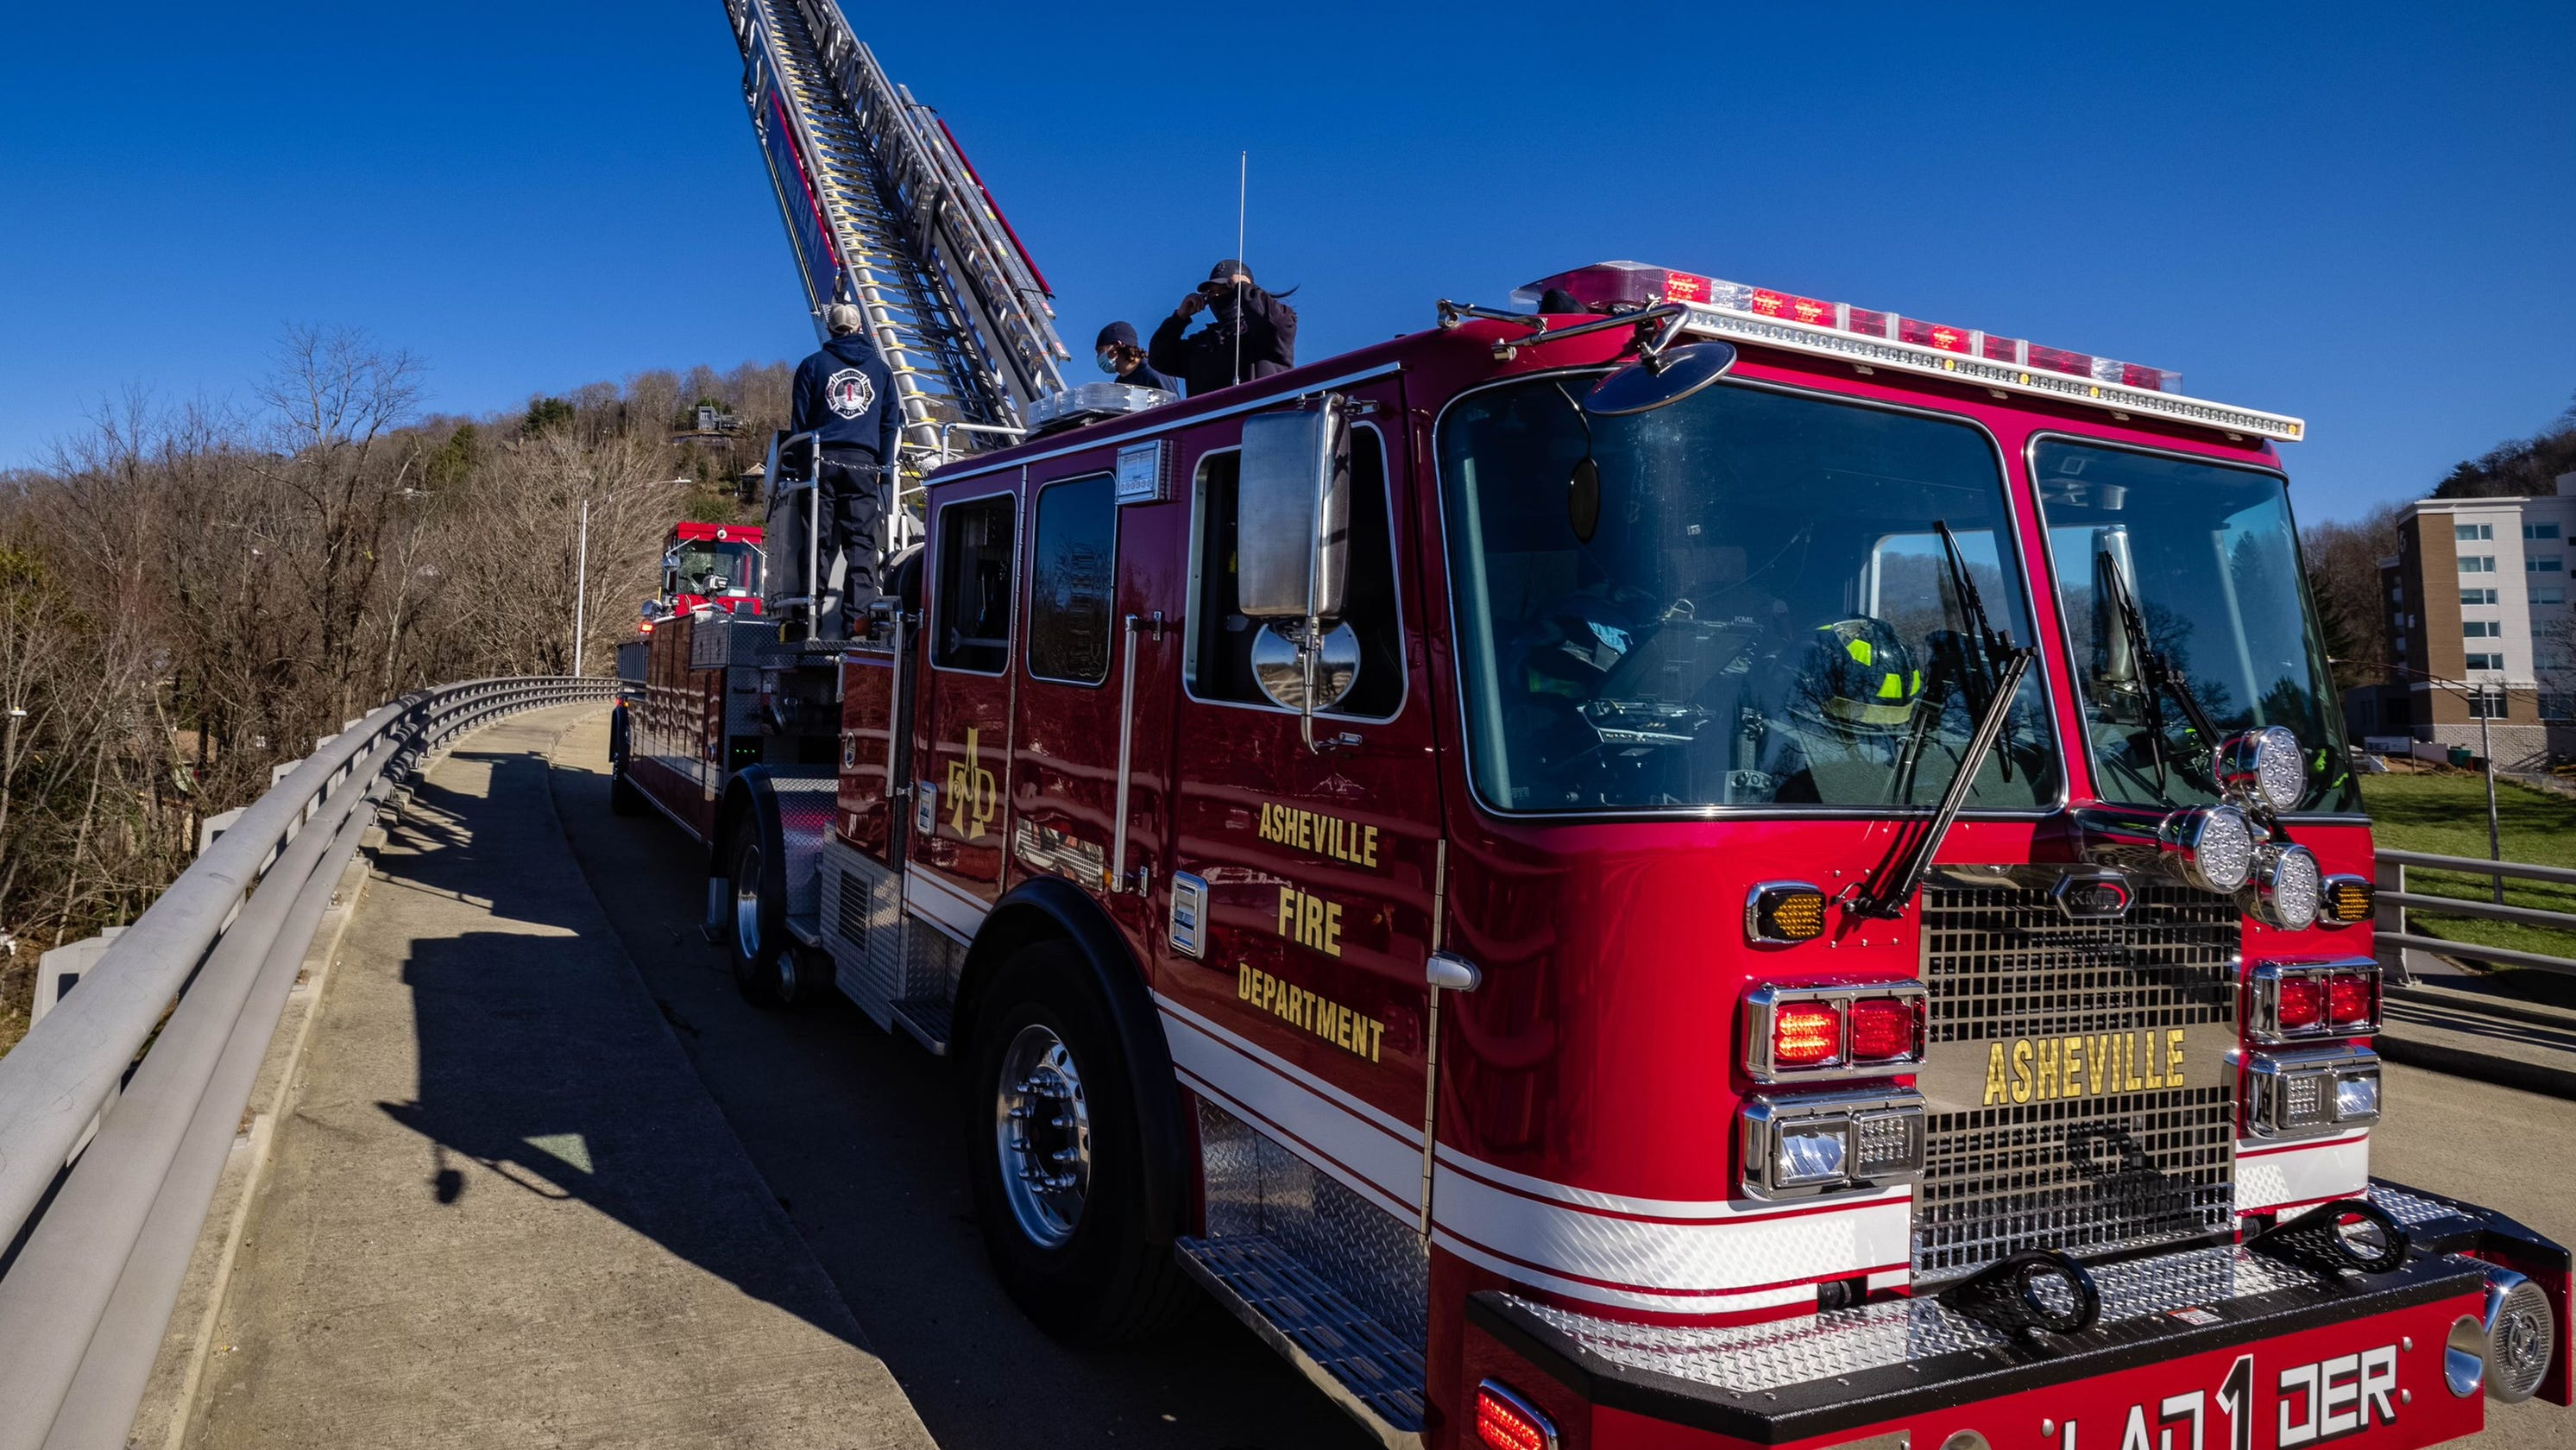 Buncombe County school teacher dies after crash with fire truck